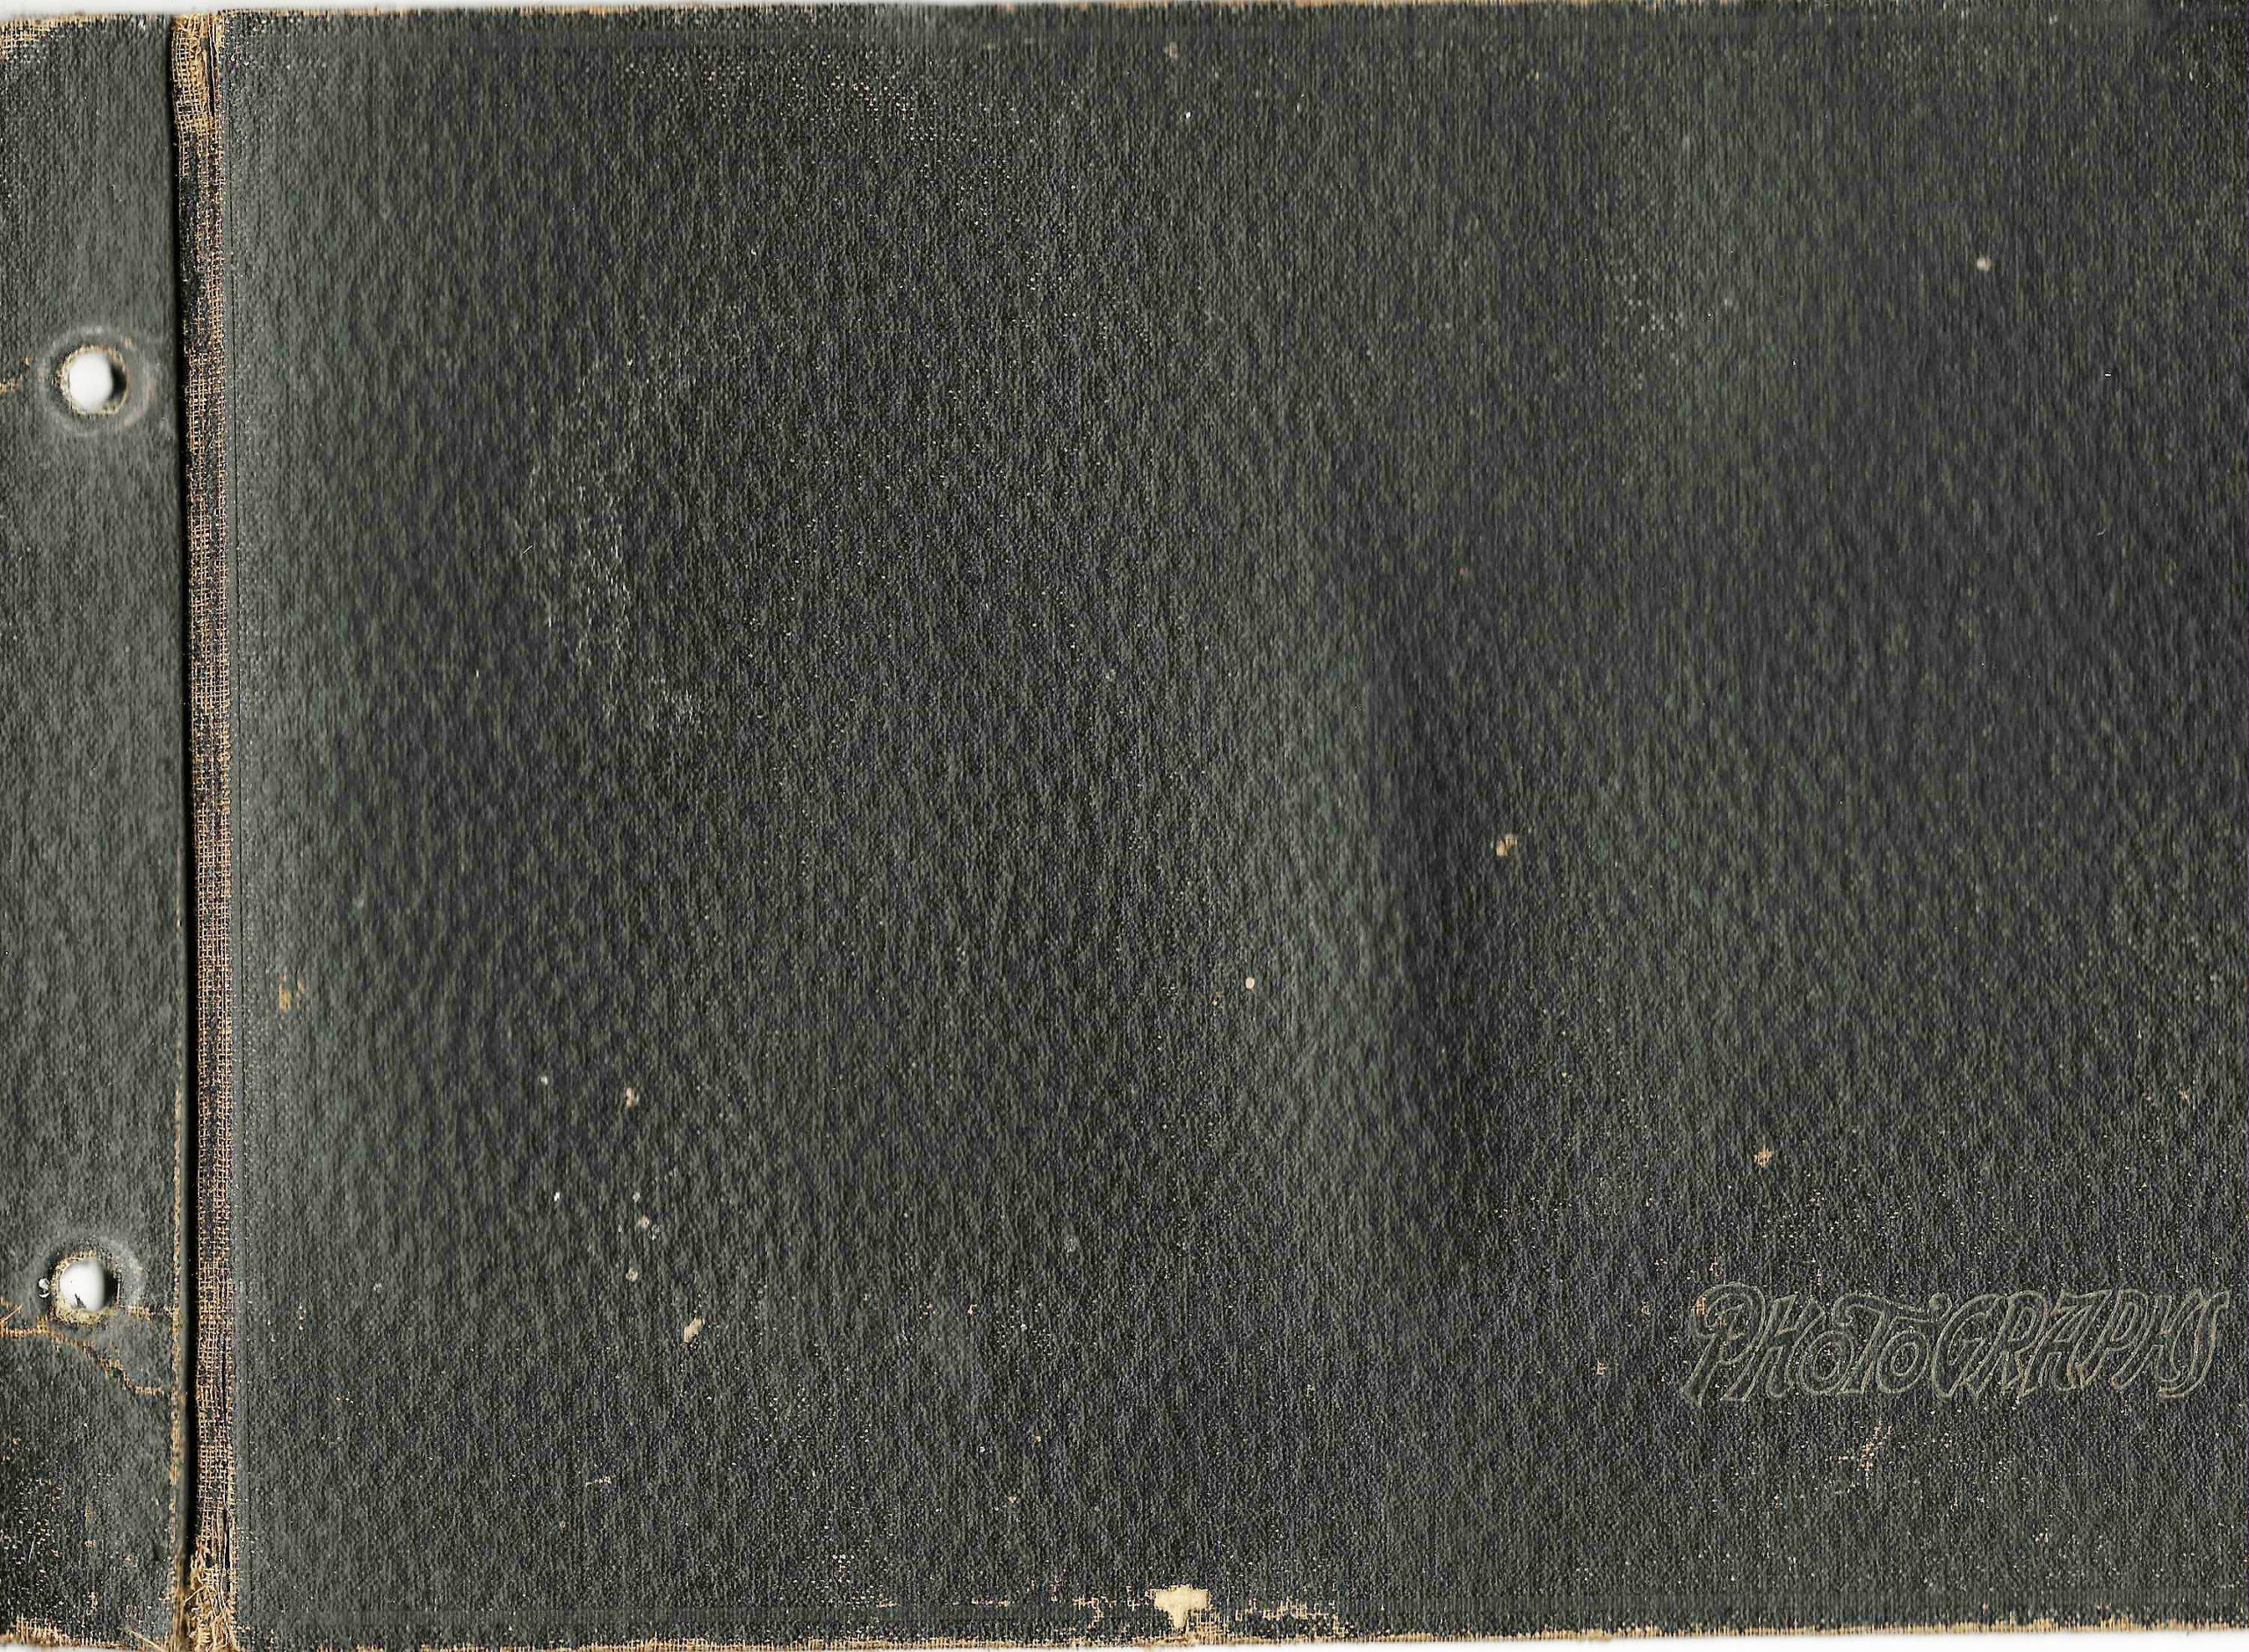 Cover of a World War I Era Photo Album